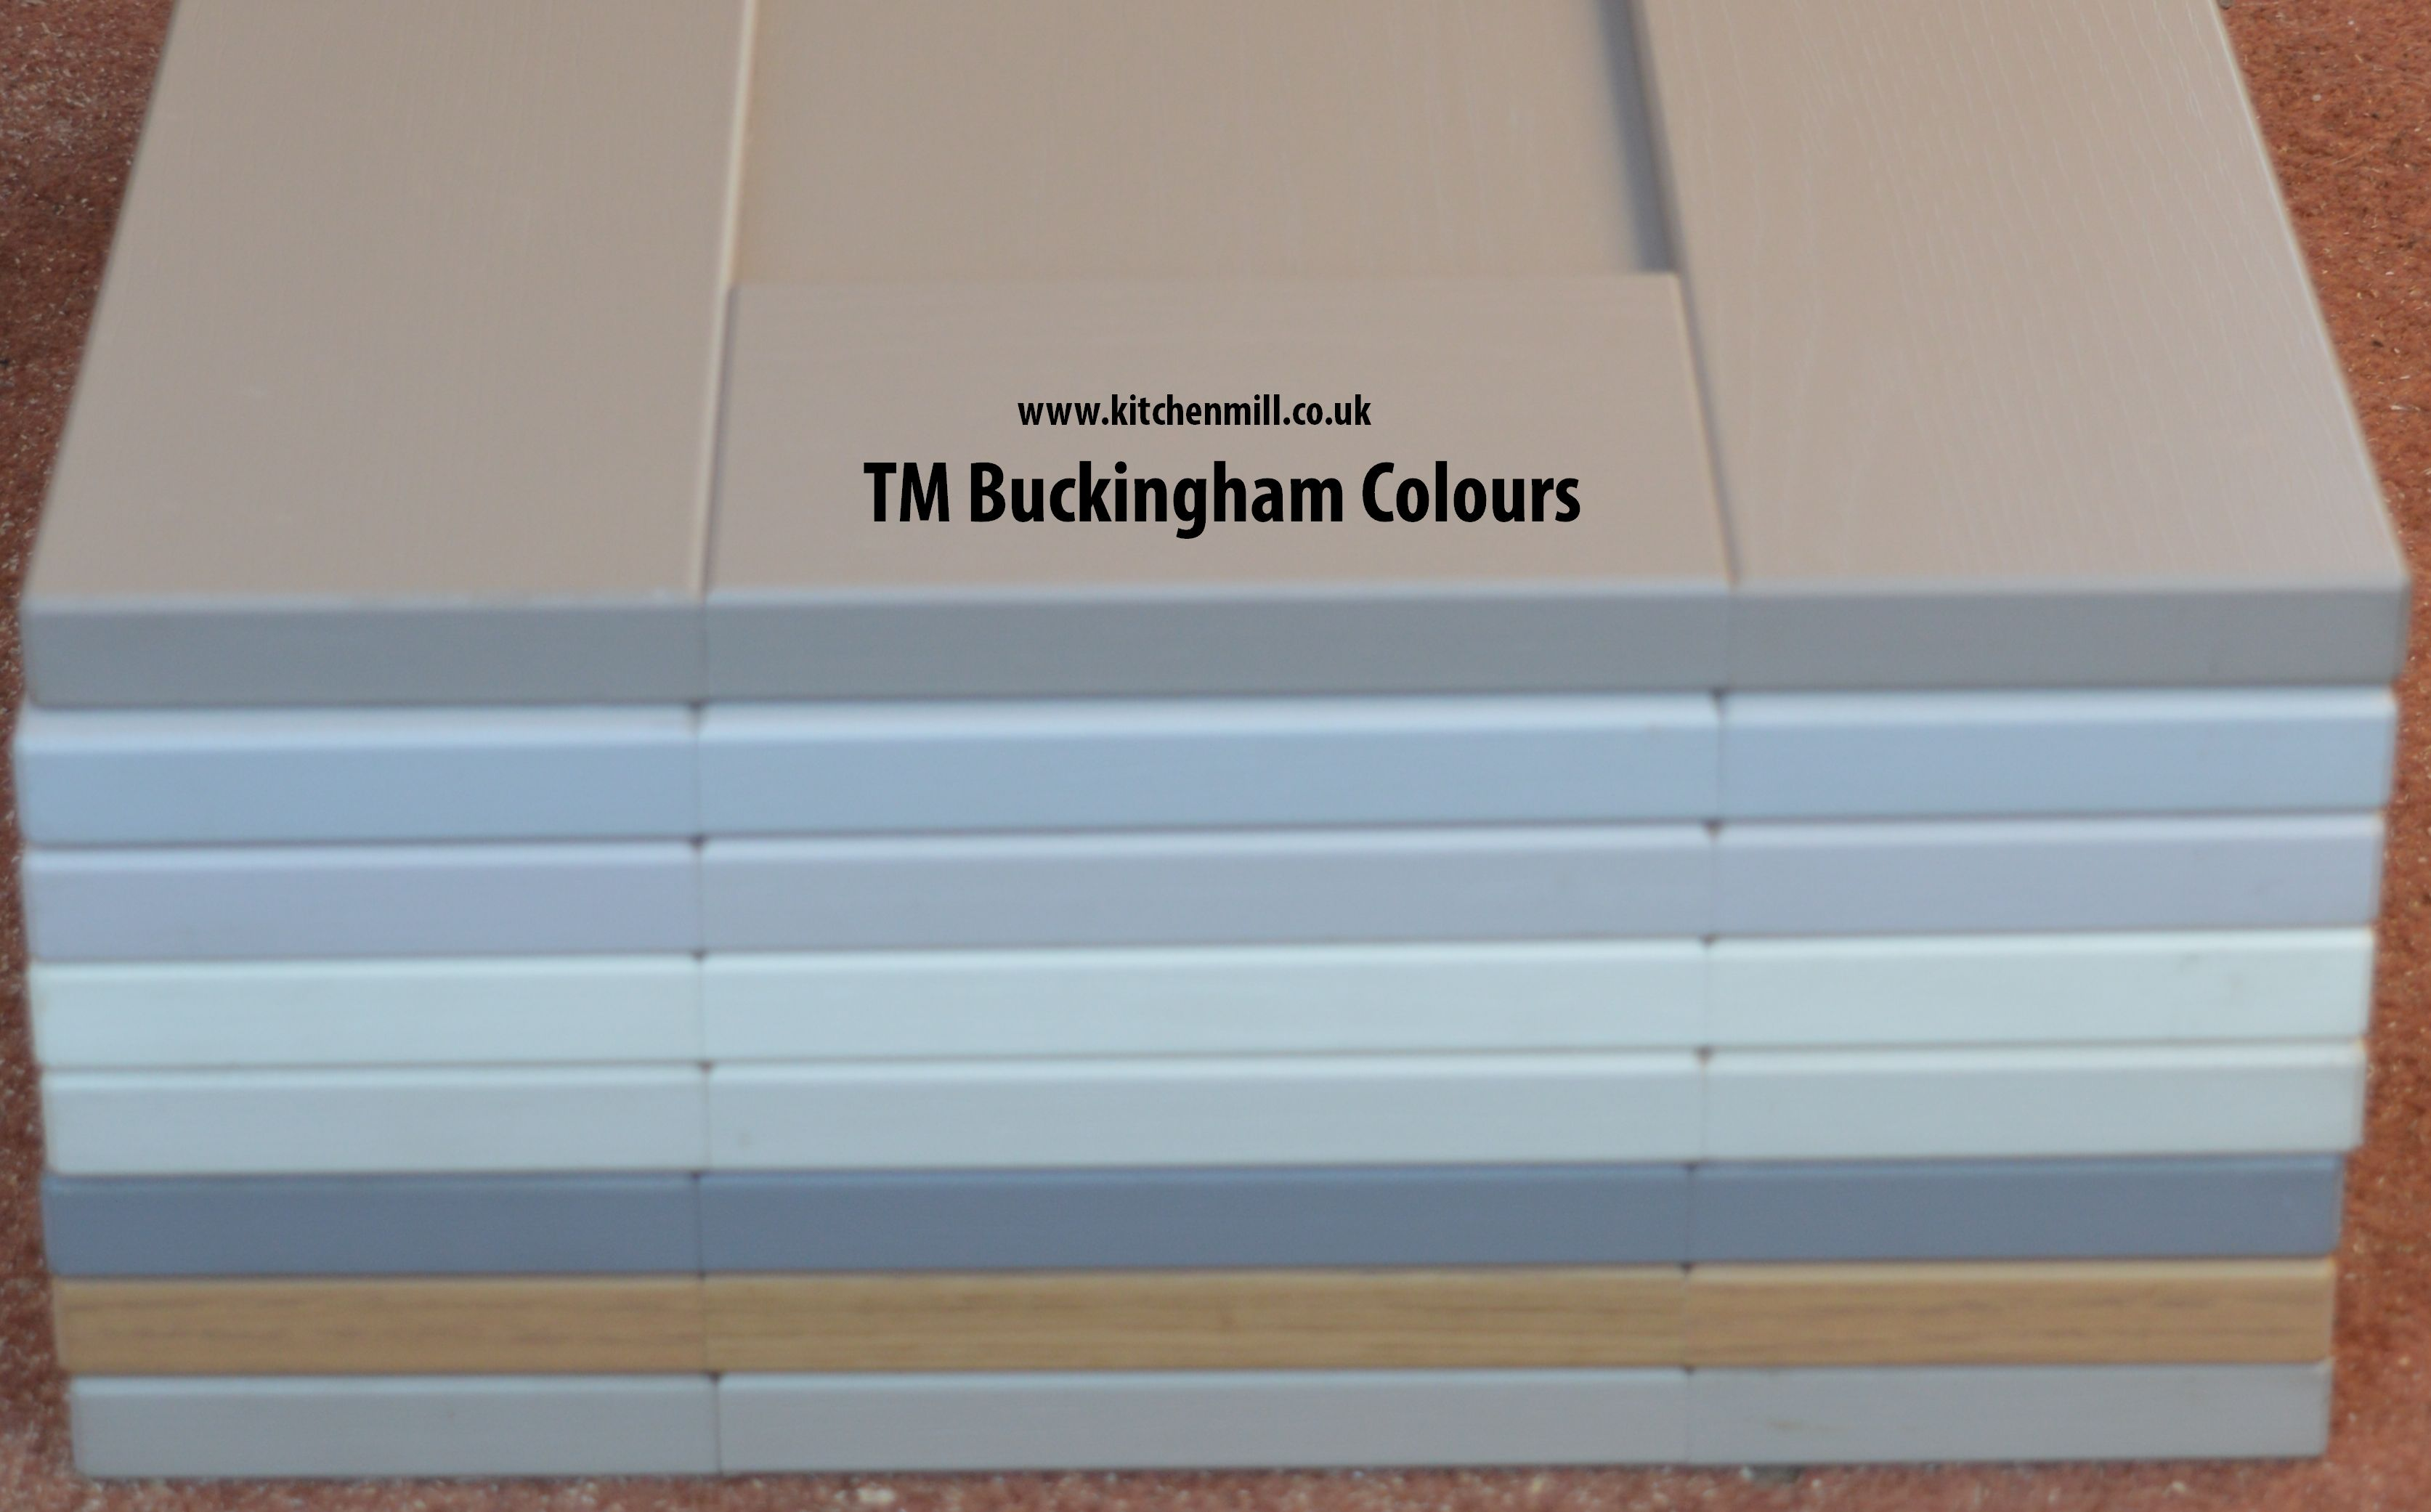 TM Buckingham 5-piece Shaker Door – PVC wrapped | Kitchen Mill